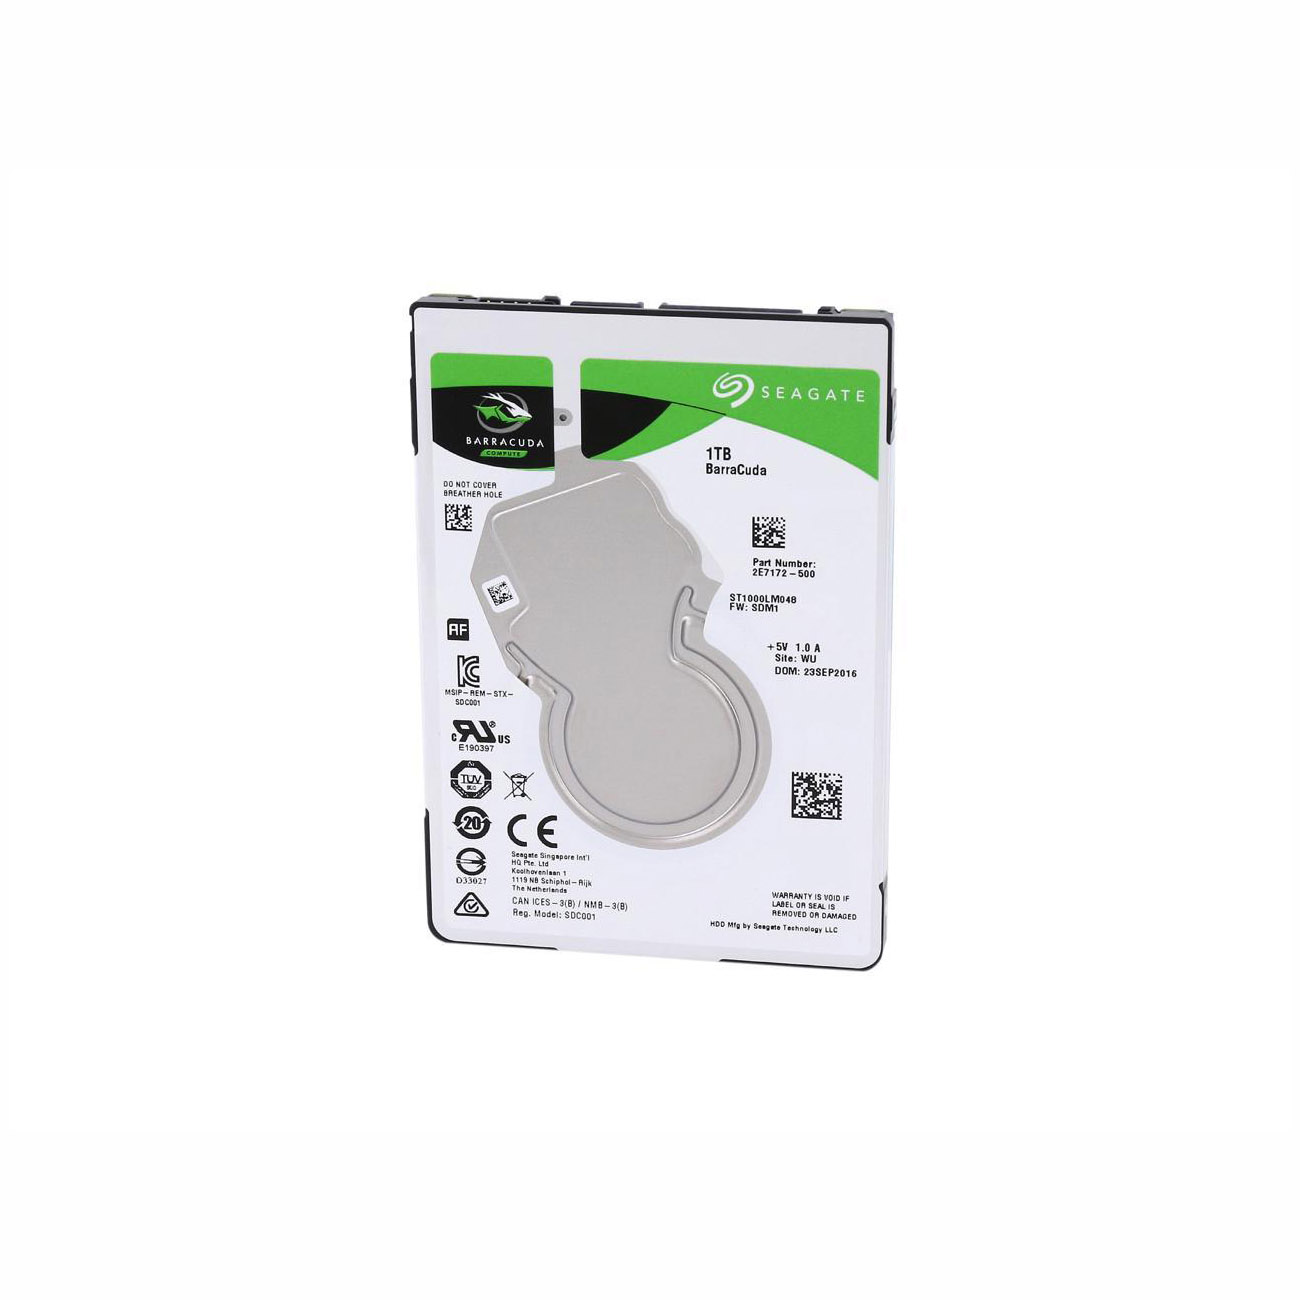 HD 1TERRA SATA SEAGATE FOR NOTEBOOK128M 5400RPM ,Laptop HDD